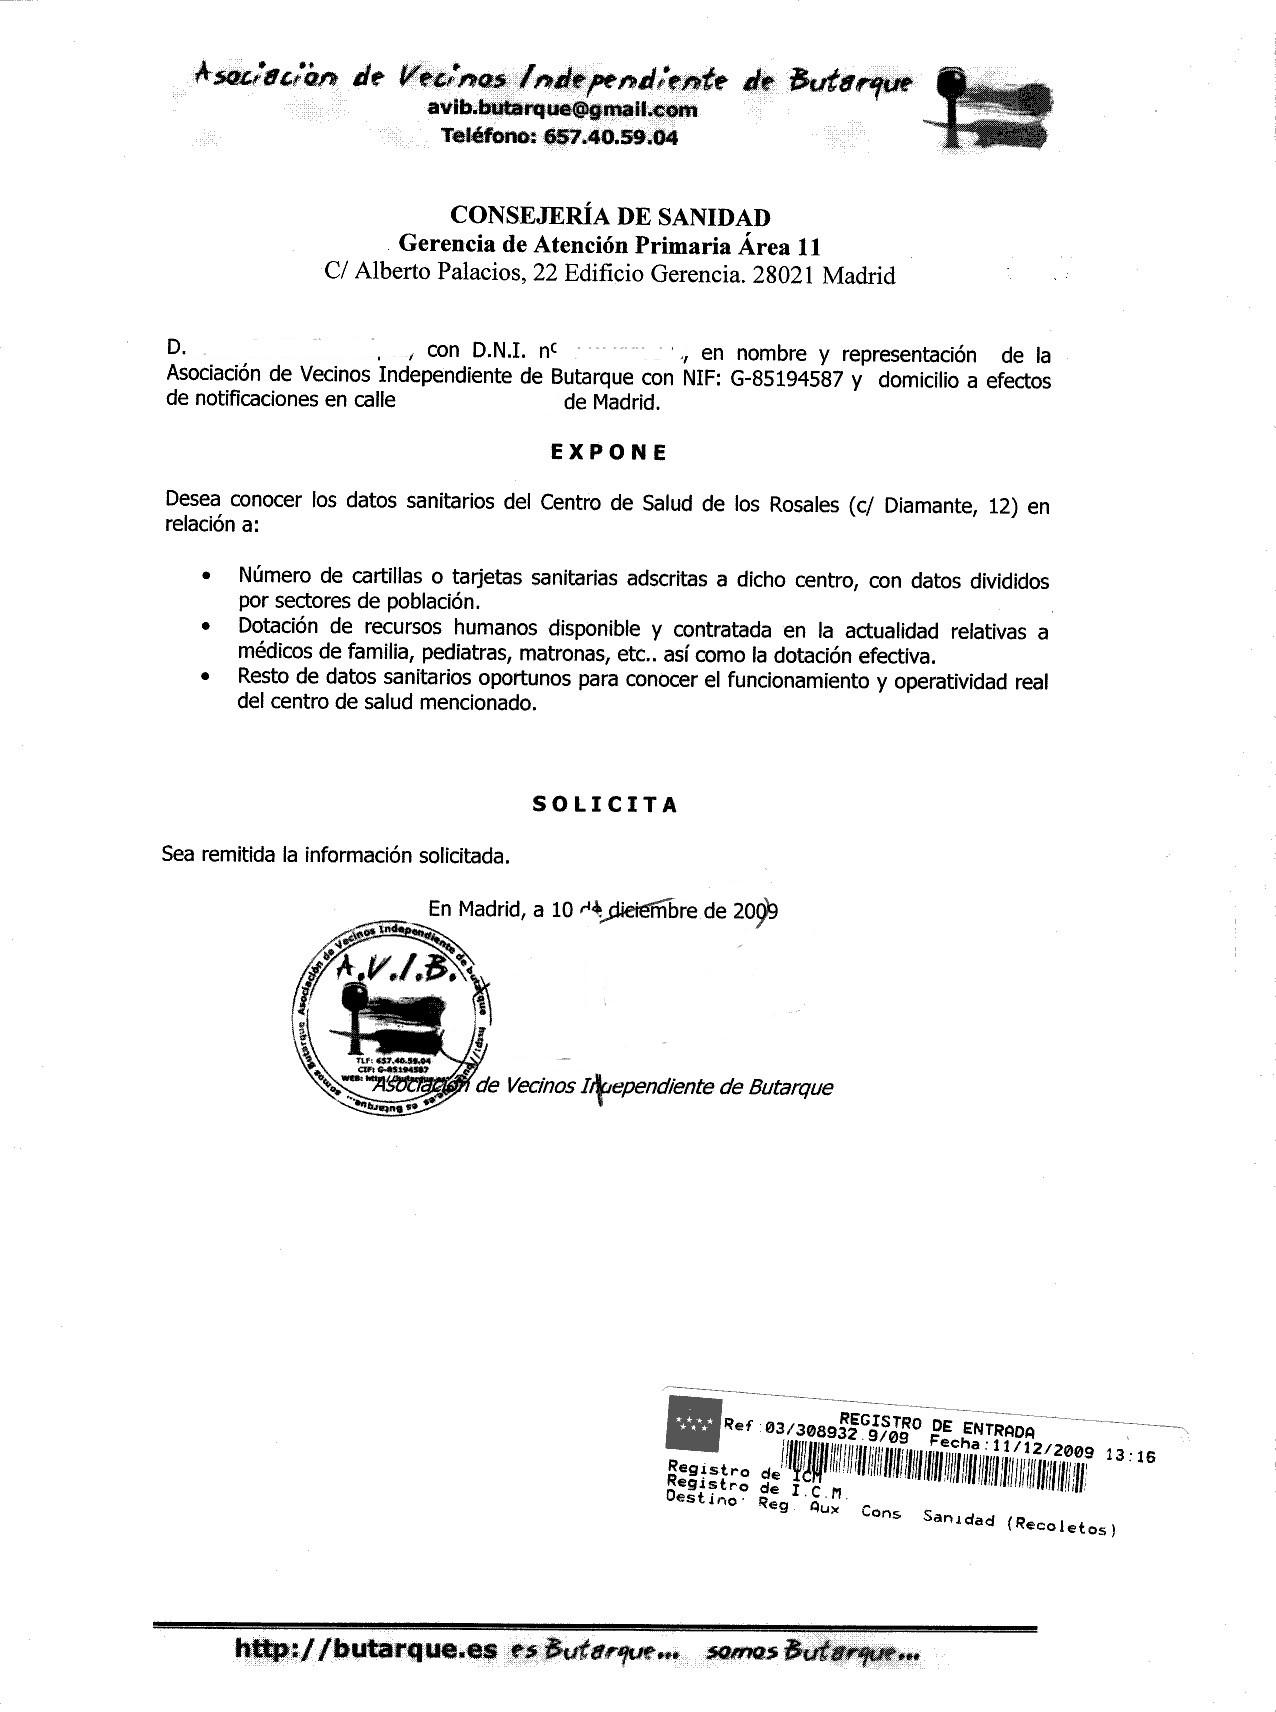 datos_sanitarios_CS_LOs_Rosales.jpg